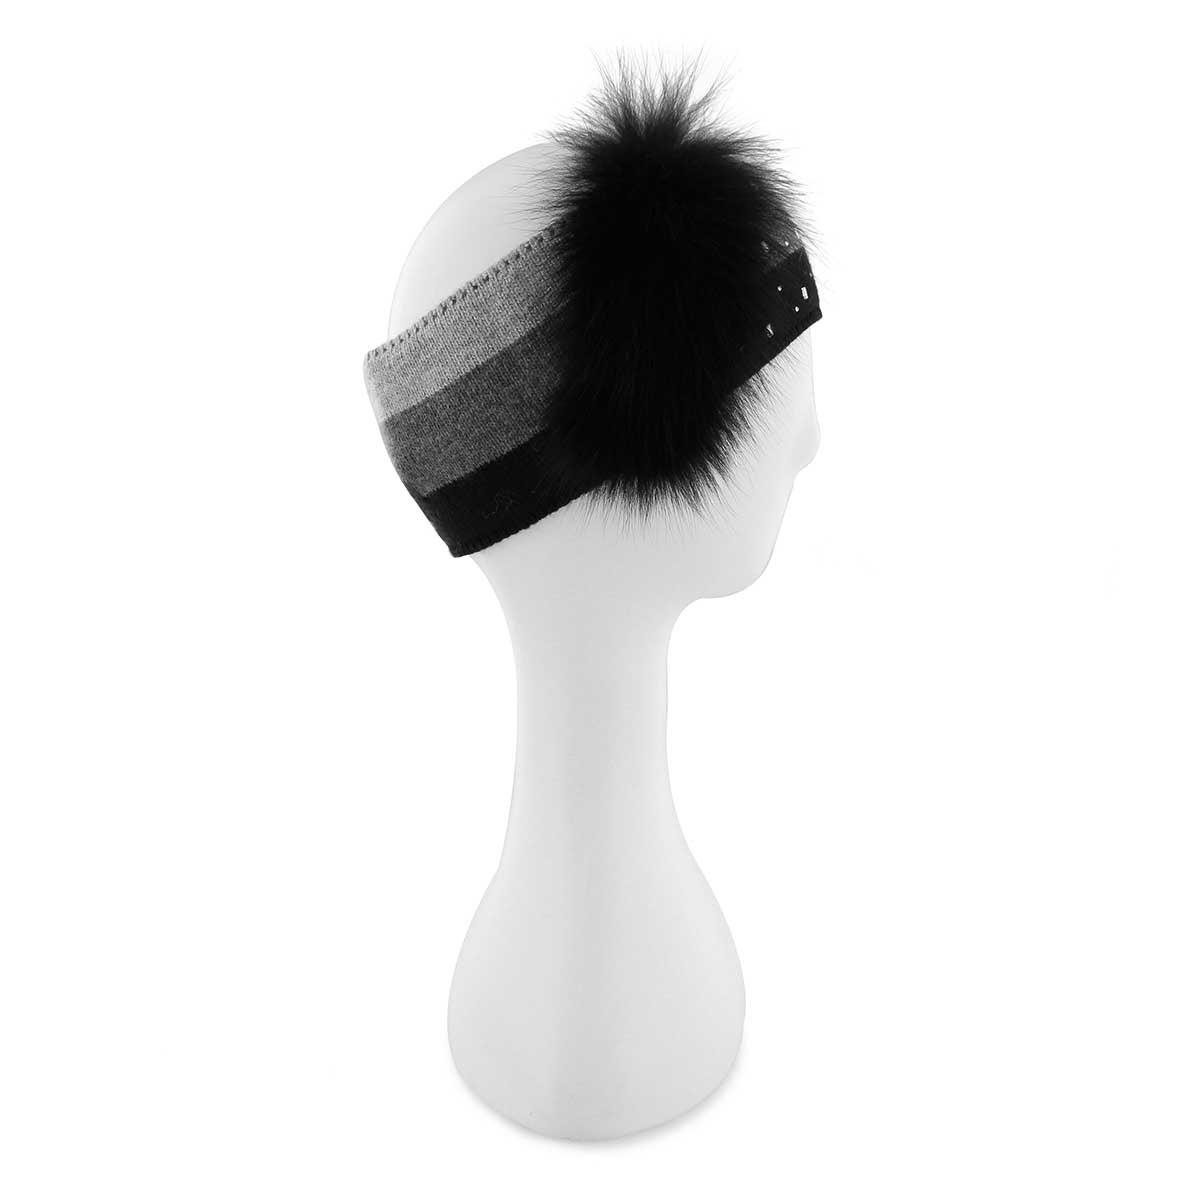 Lds rhinestone w/fur charcoal headband